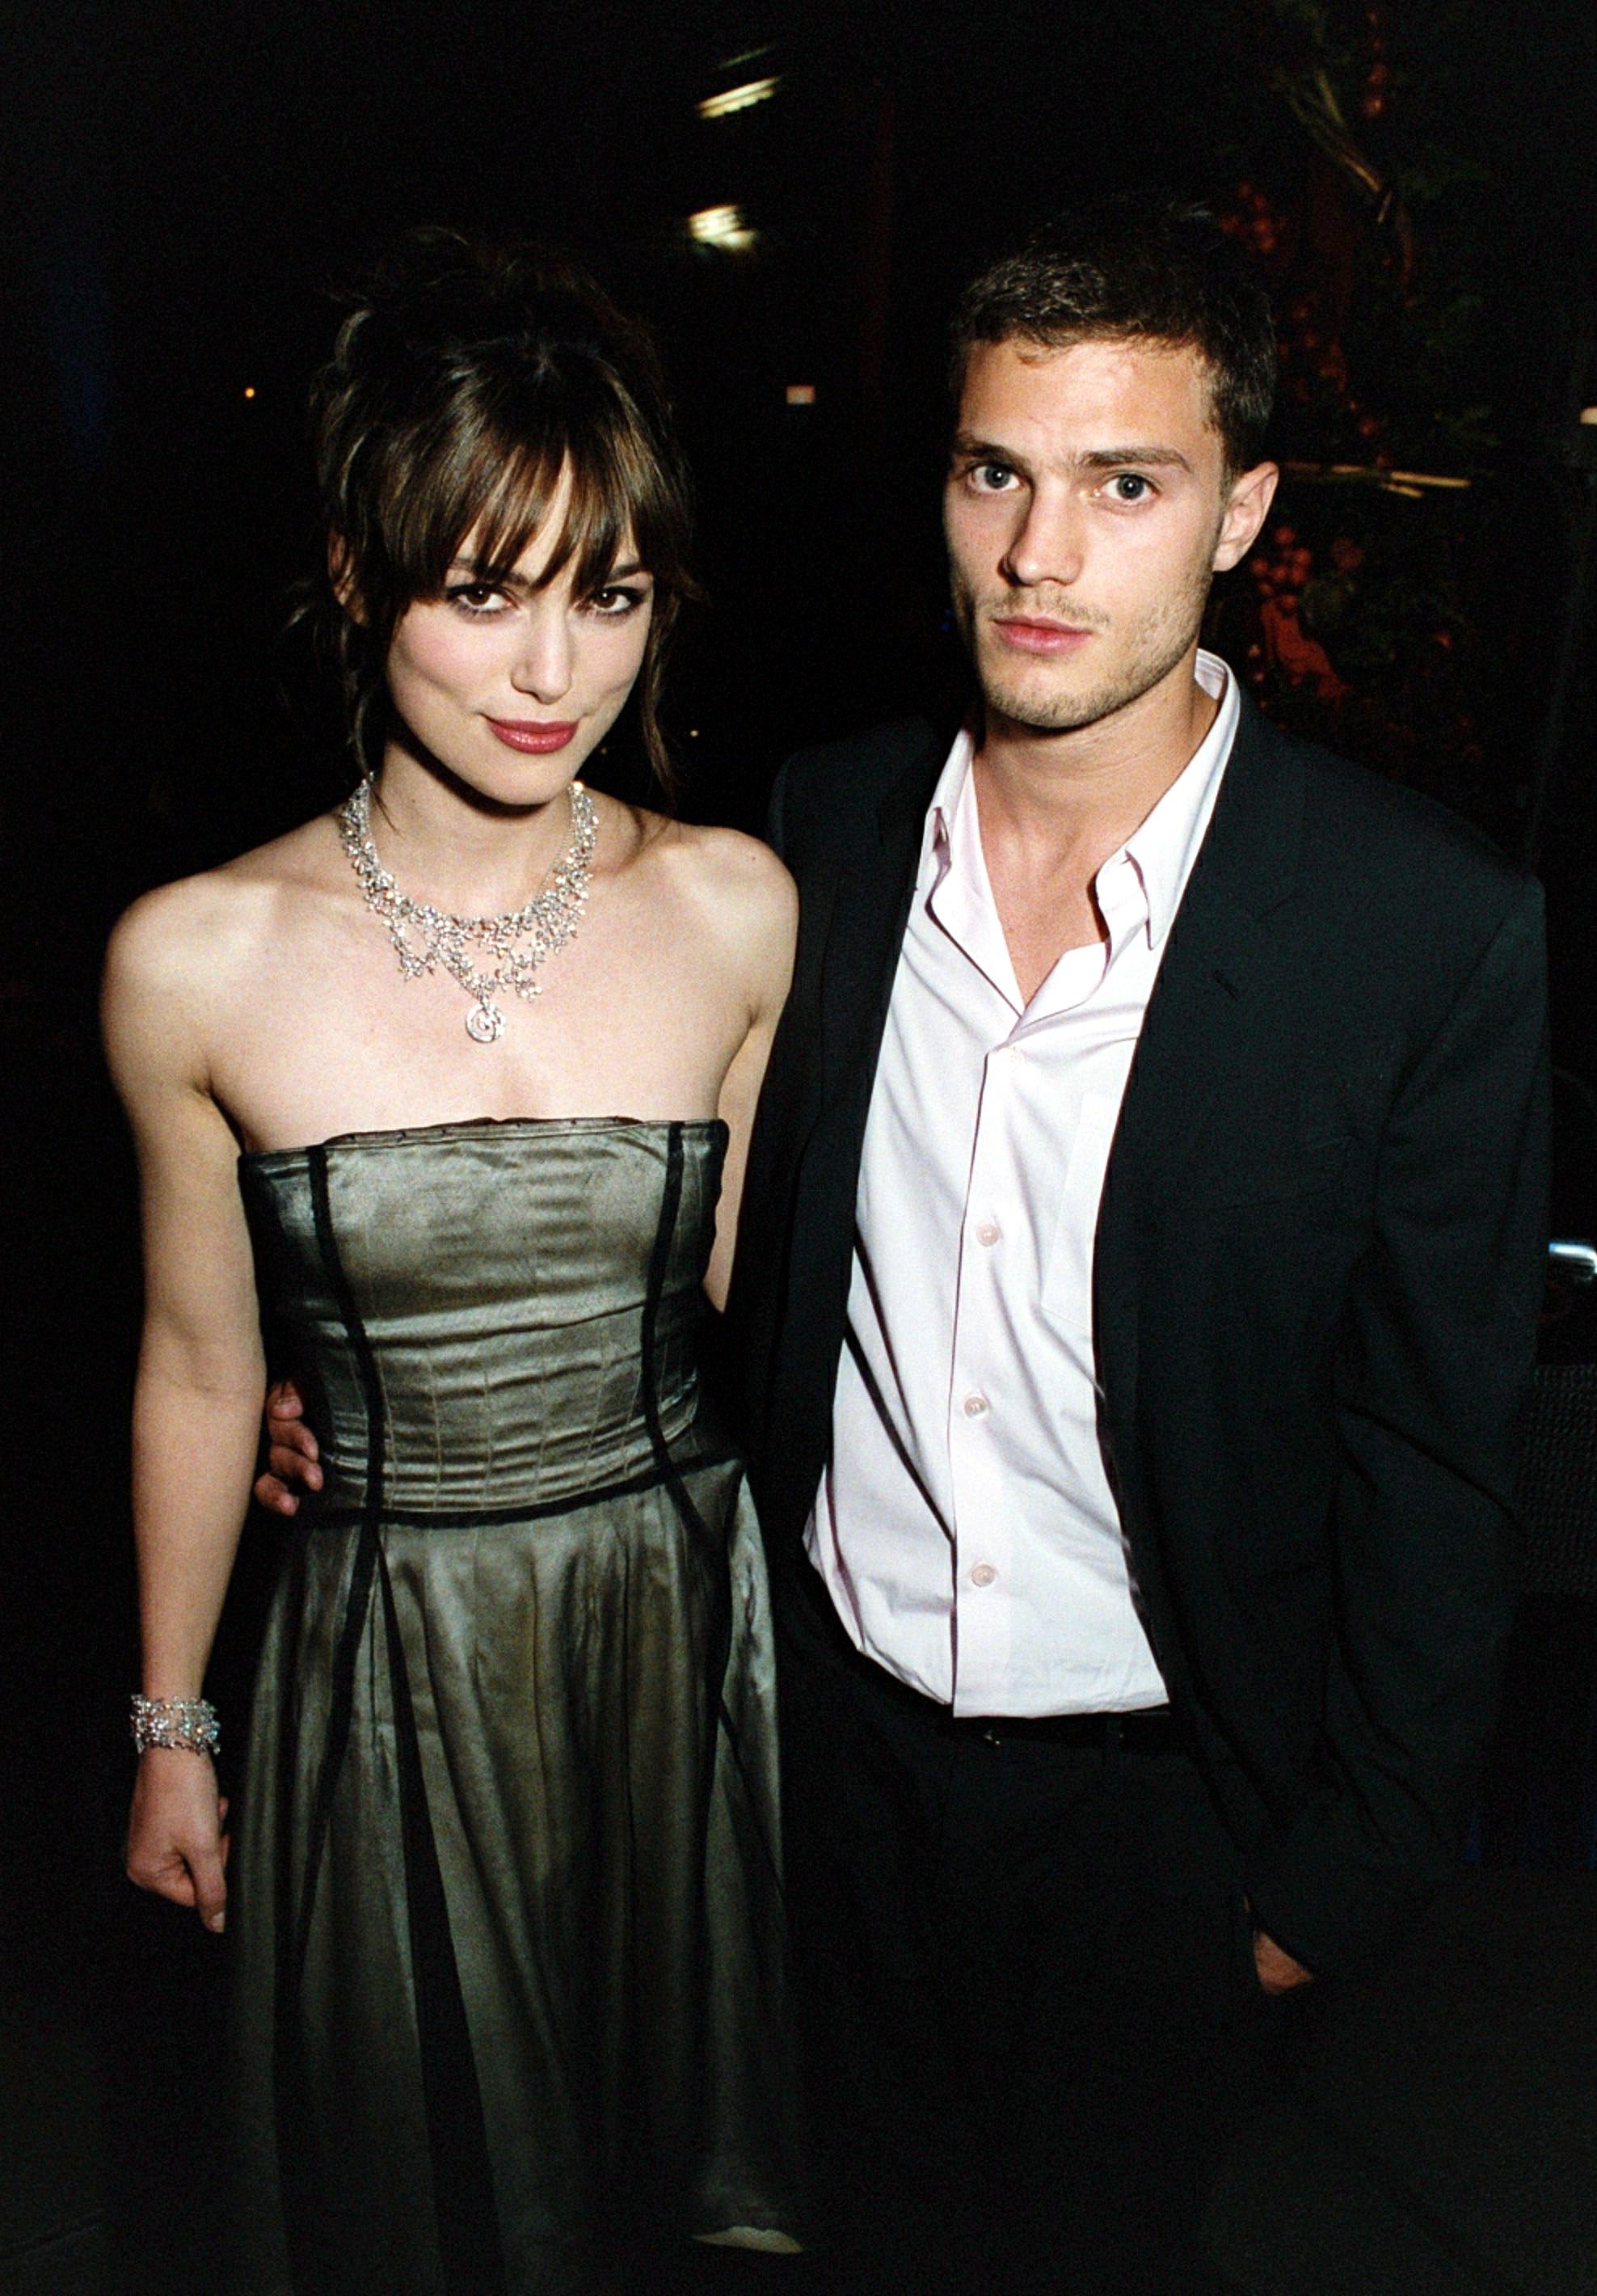 Keira Knightley, boyfriend Jamie Dornan